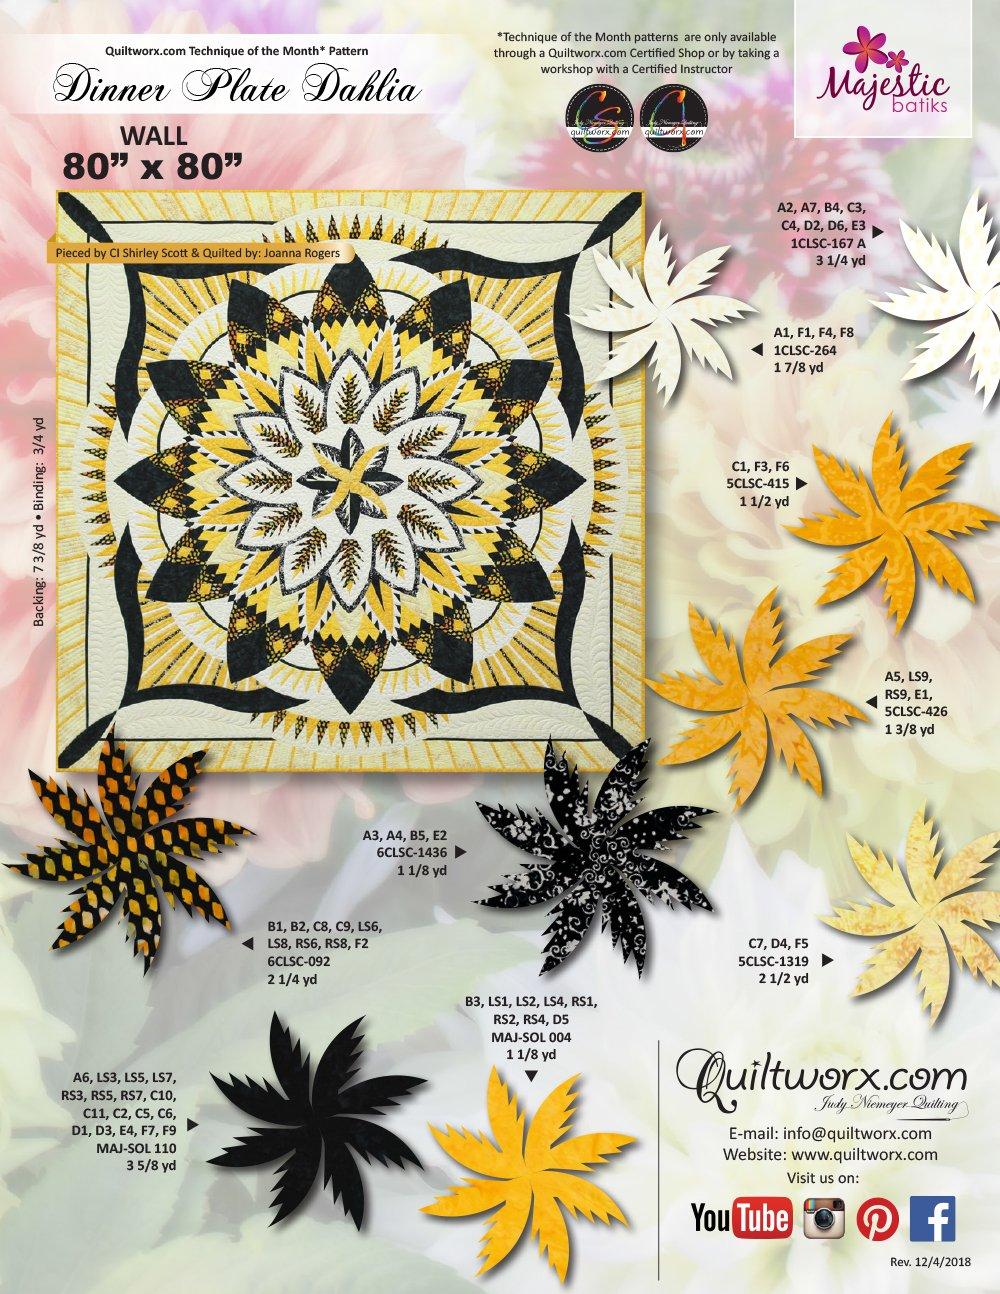 Quiltworx Dinner Plate Dahlia Wall pattern